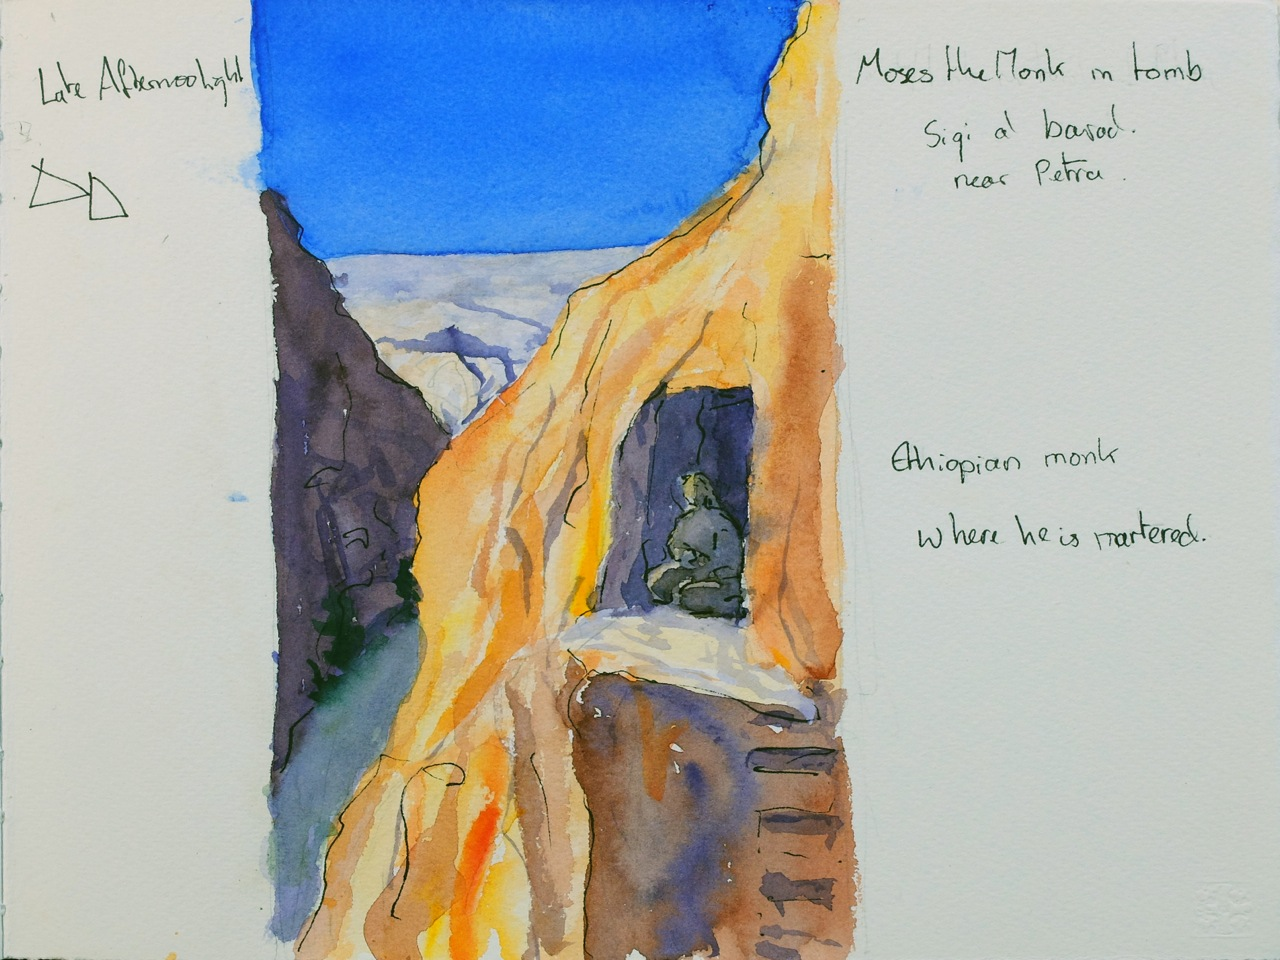 Abba Moses the Black near Petra